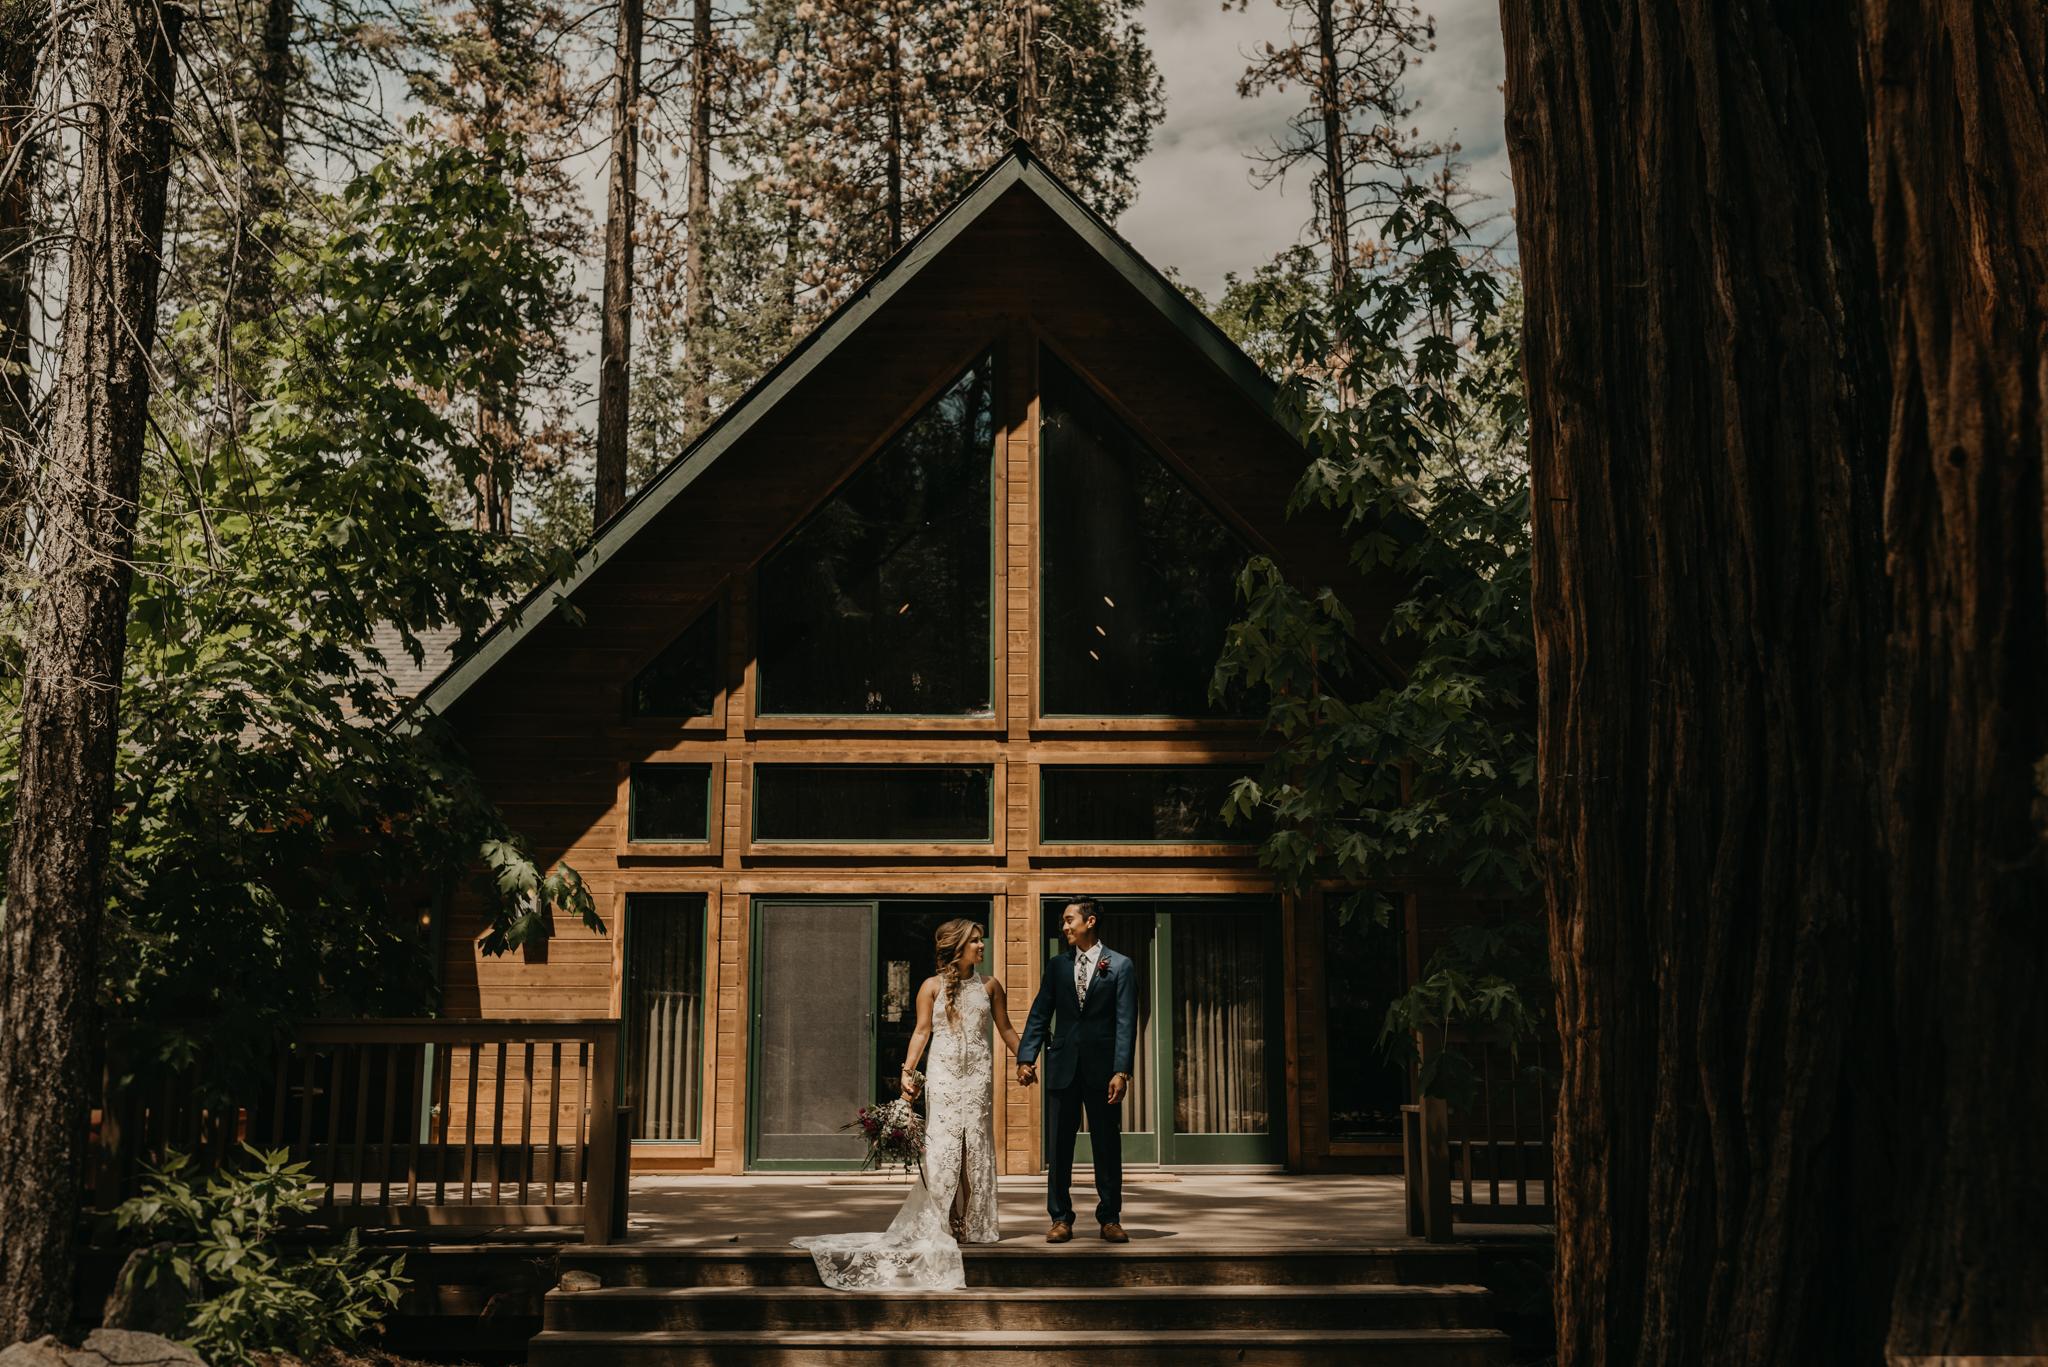 © Isaiah + Taylor Photography - Evergreen Lodge Destination Yoesmite Wedding - Los Angeles Wedding Photographer-080.jpg